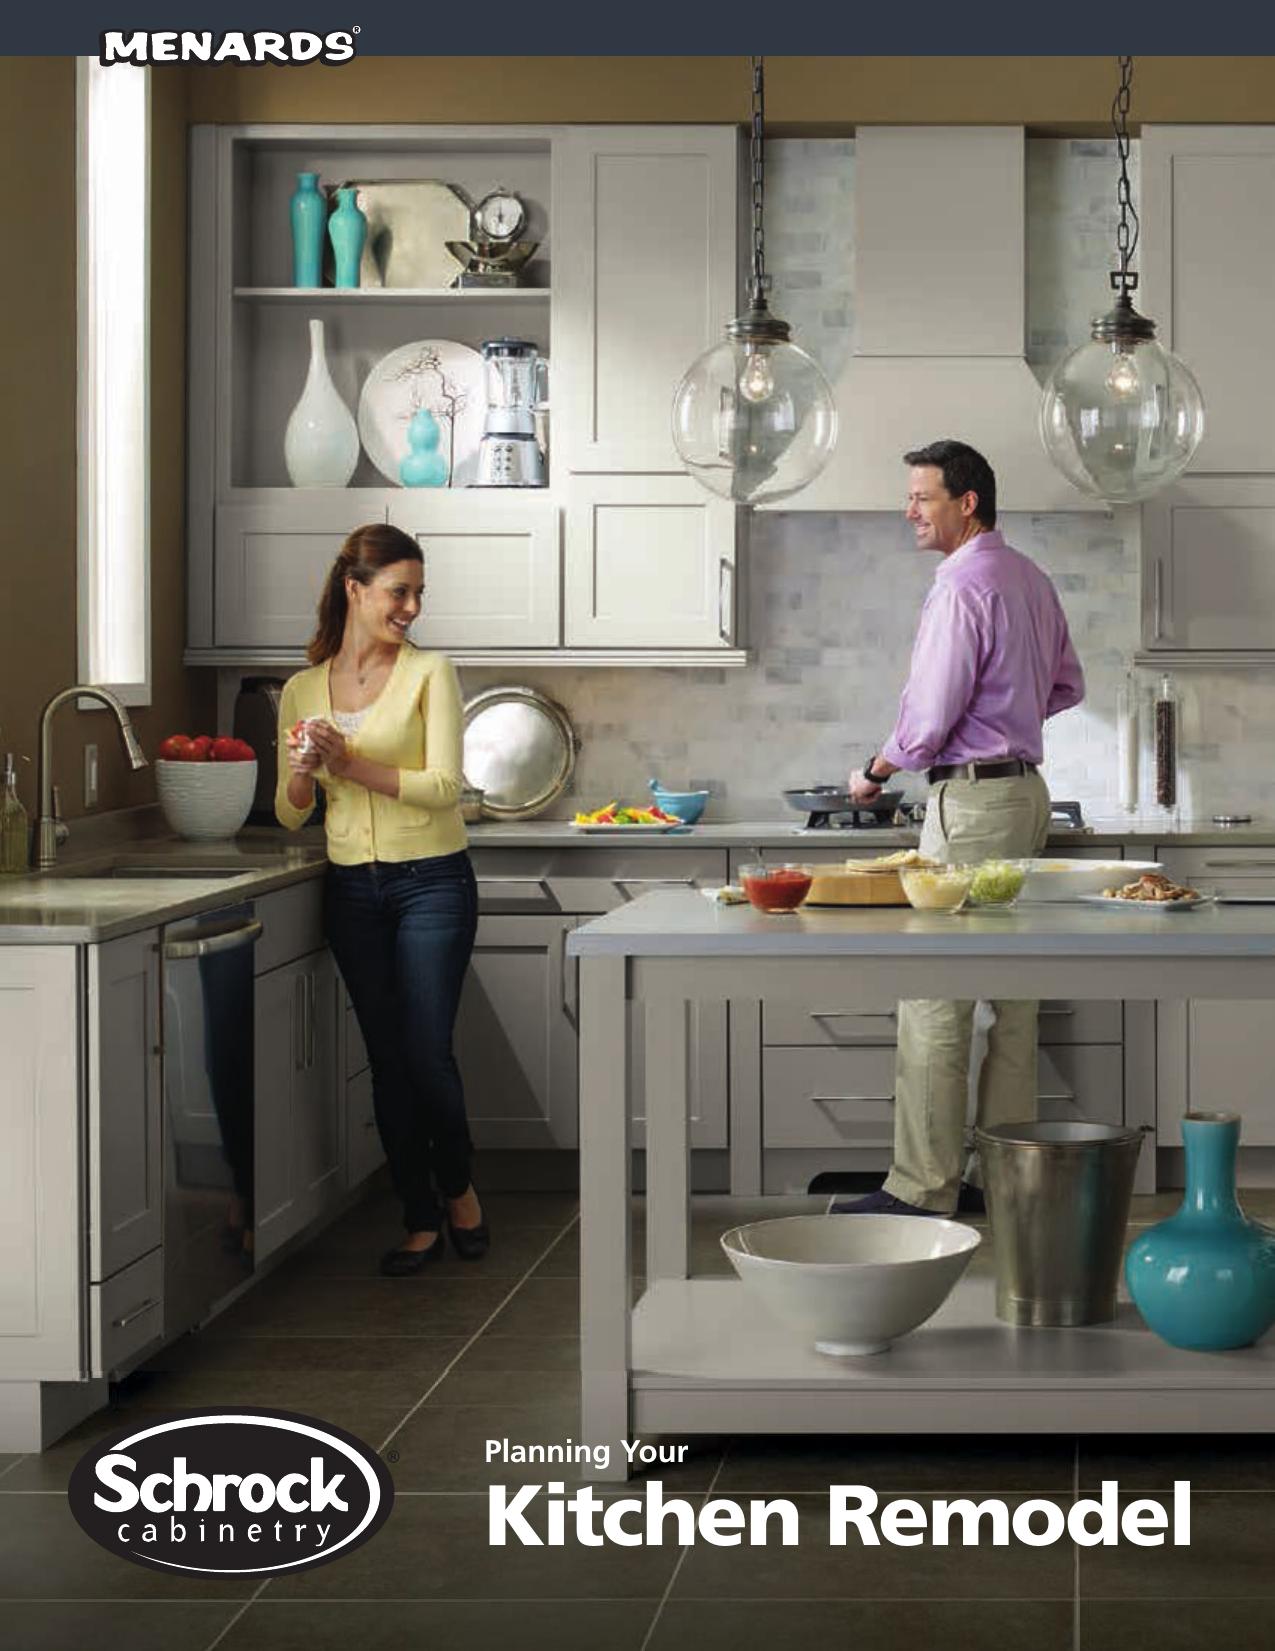 Kitchen Remodel - Schrock At Menards | manualzz com